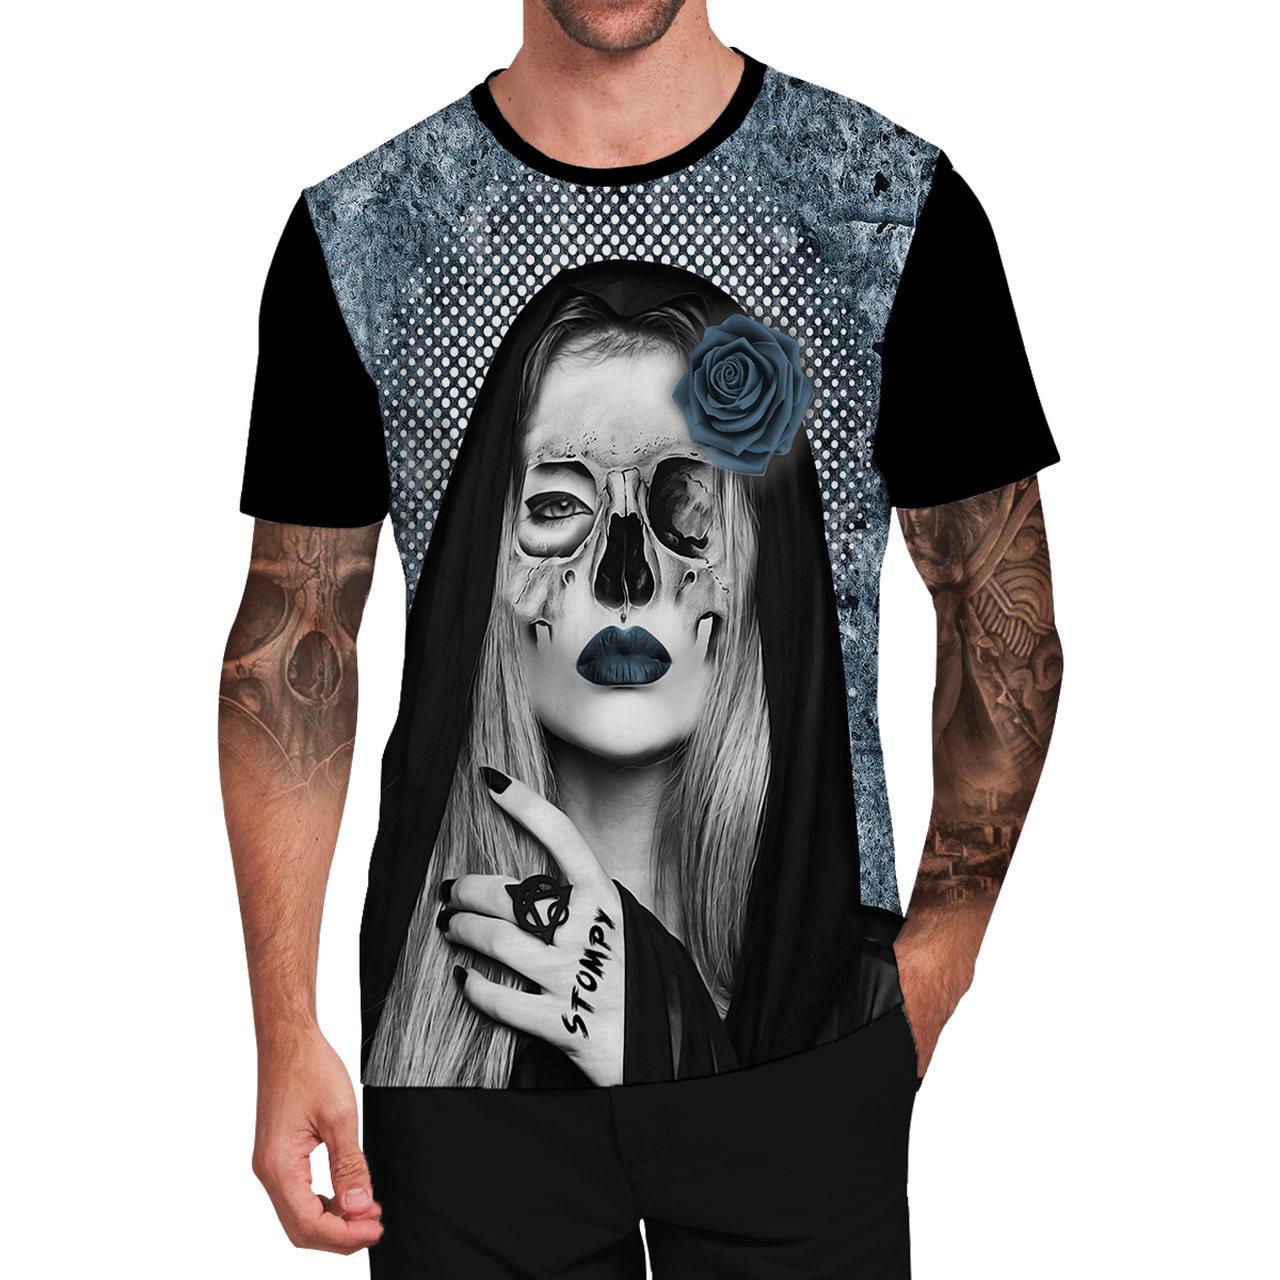 Stompy Camiseta Tattoo Tatuagem Caveira Skull 143